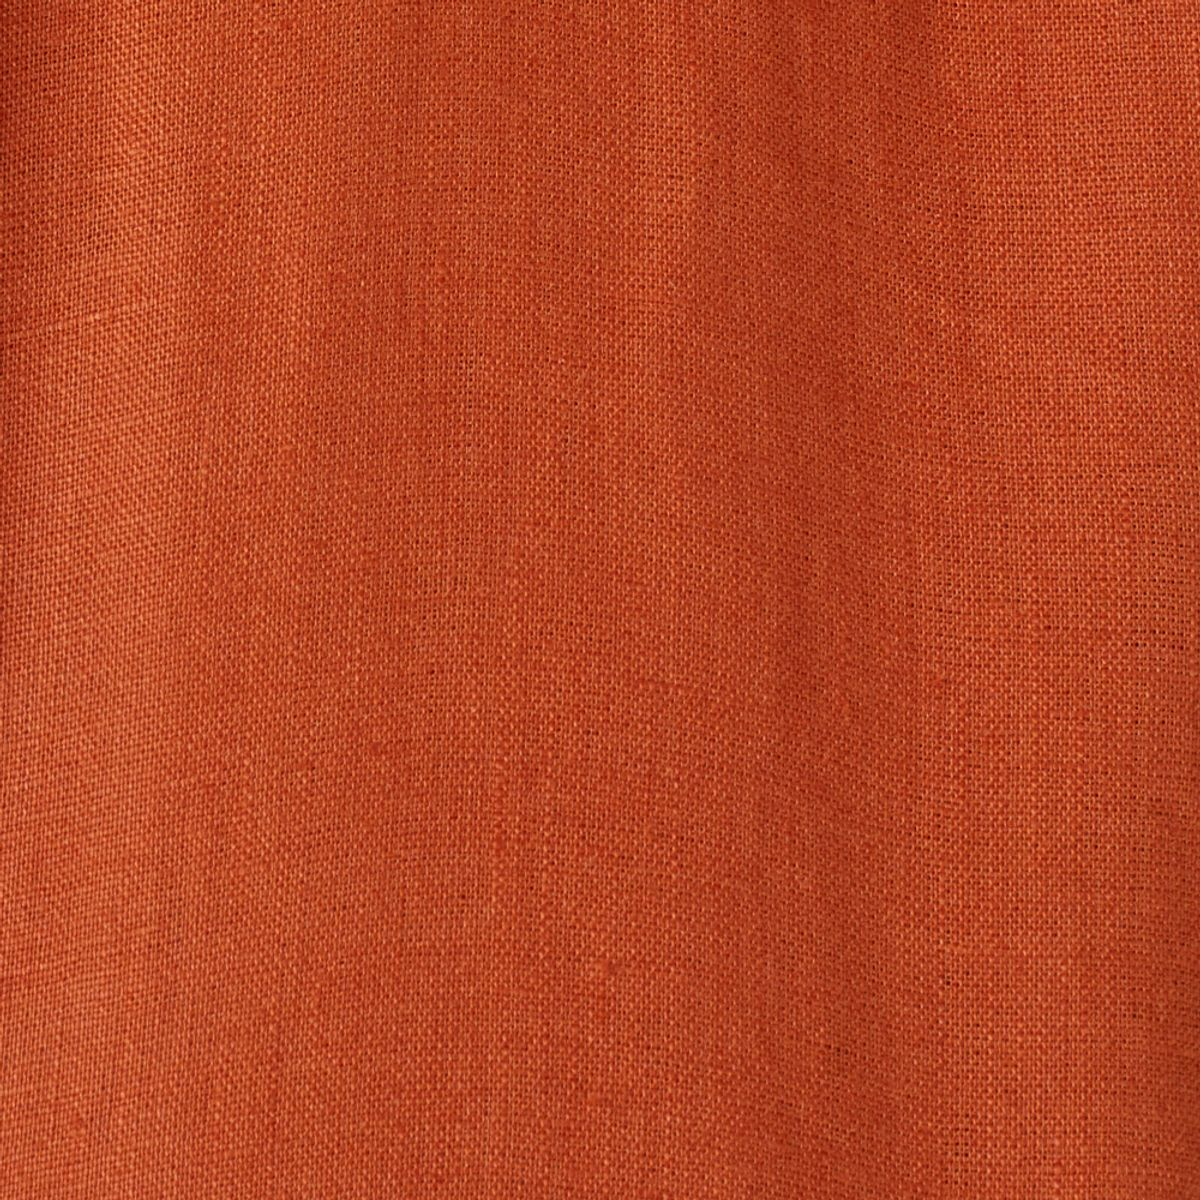 CM031080_9029_5-CAMISA-LINHO-BLOOM-MARIEL-NKO